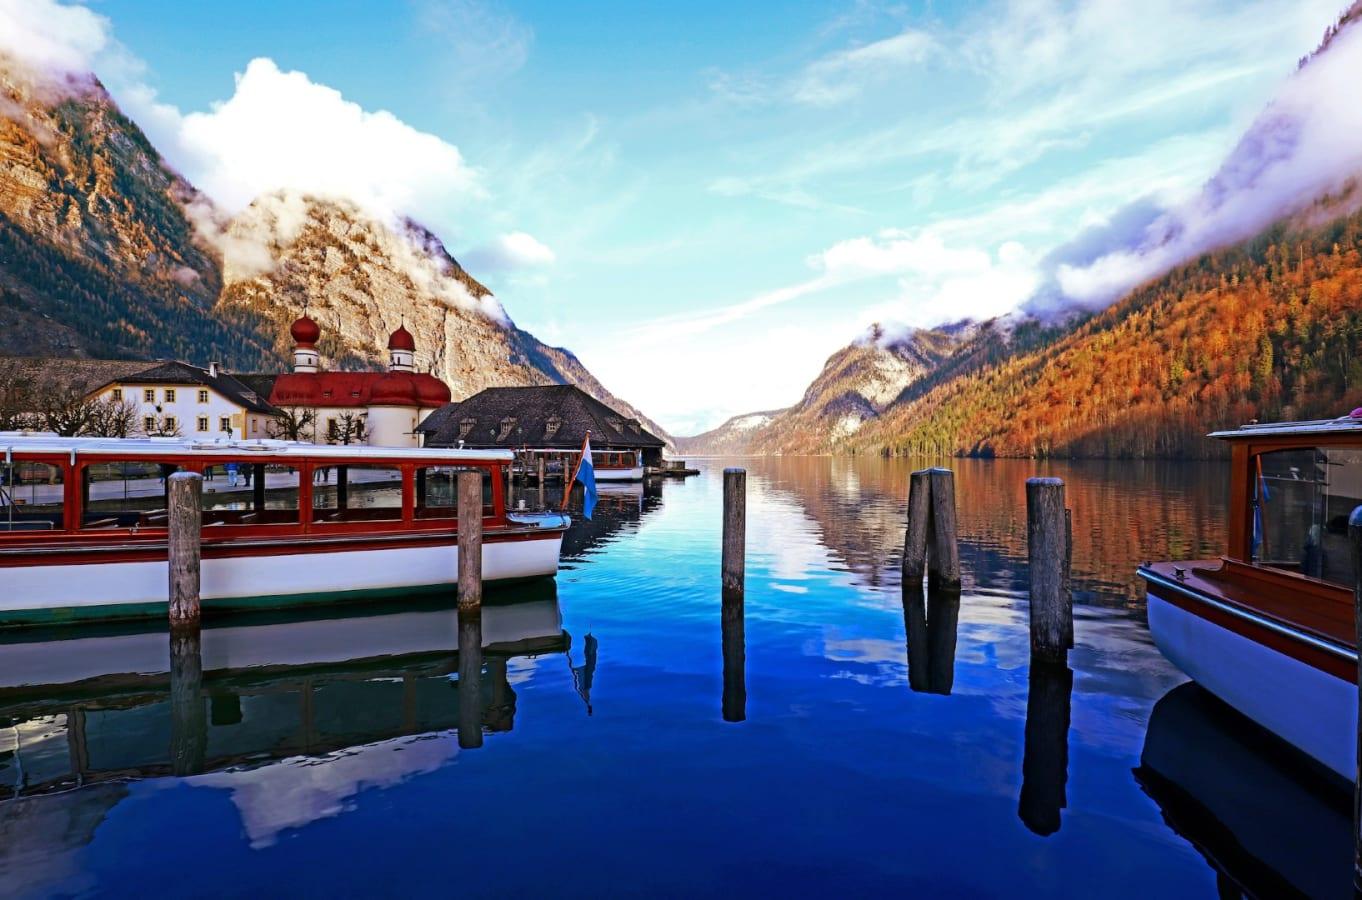 دریاچه کینگ آلمان